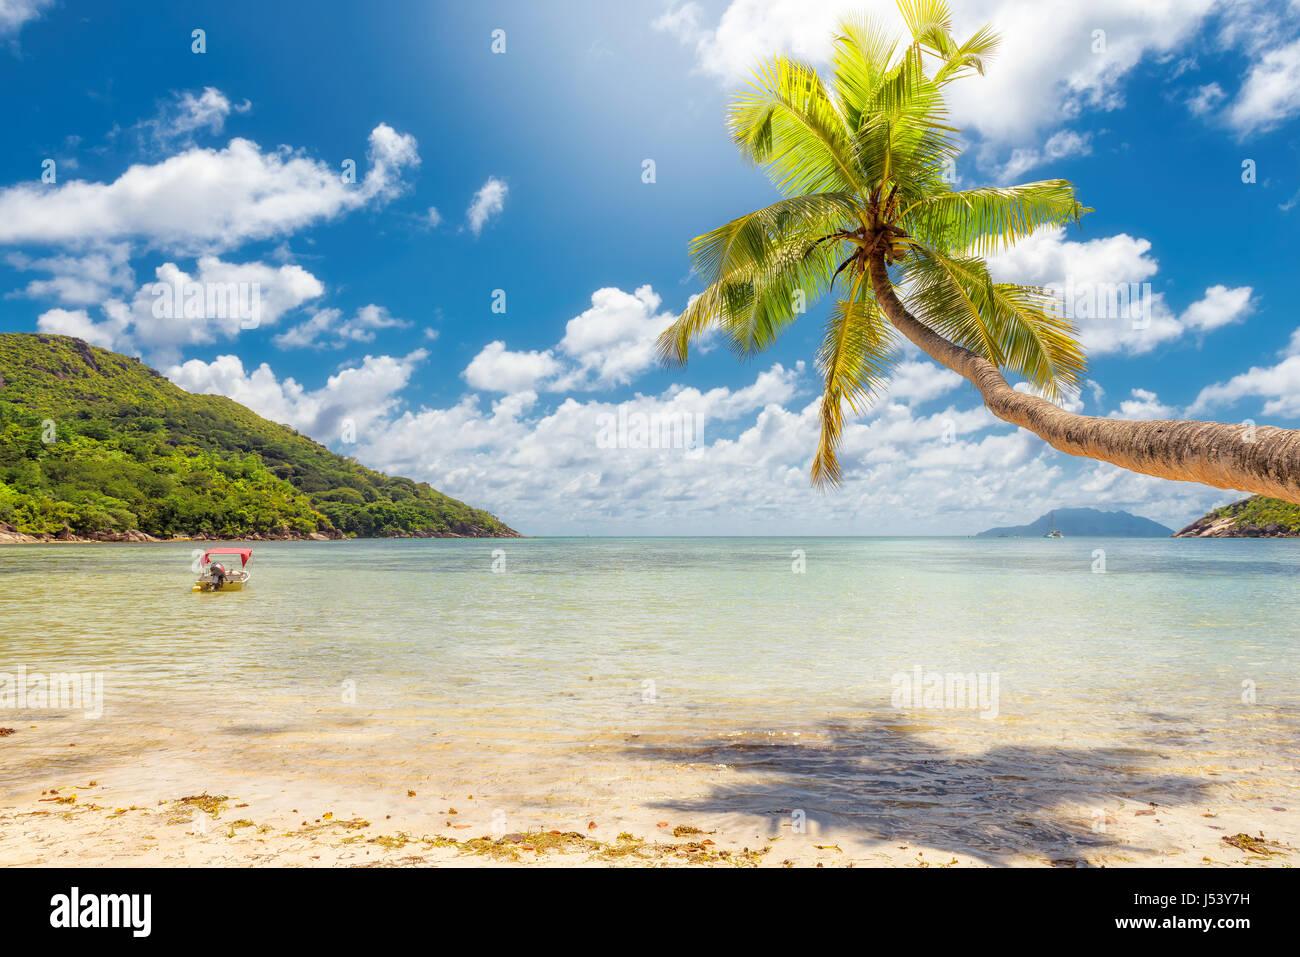 Palmen am Strand unter Meer im sonnigen Tag Stockbild